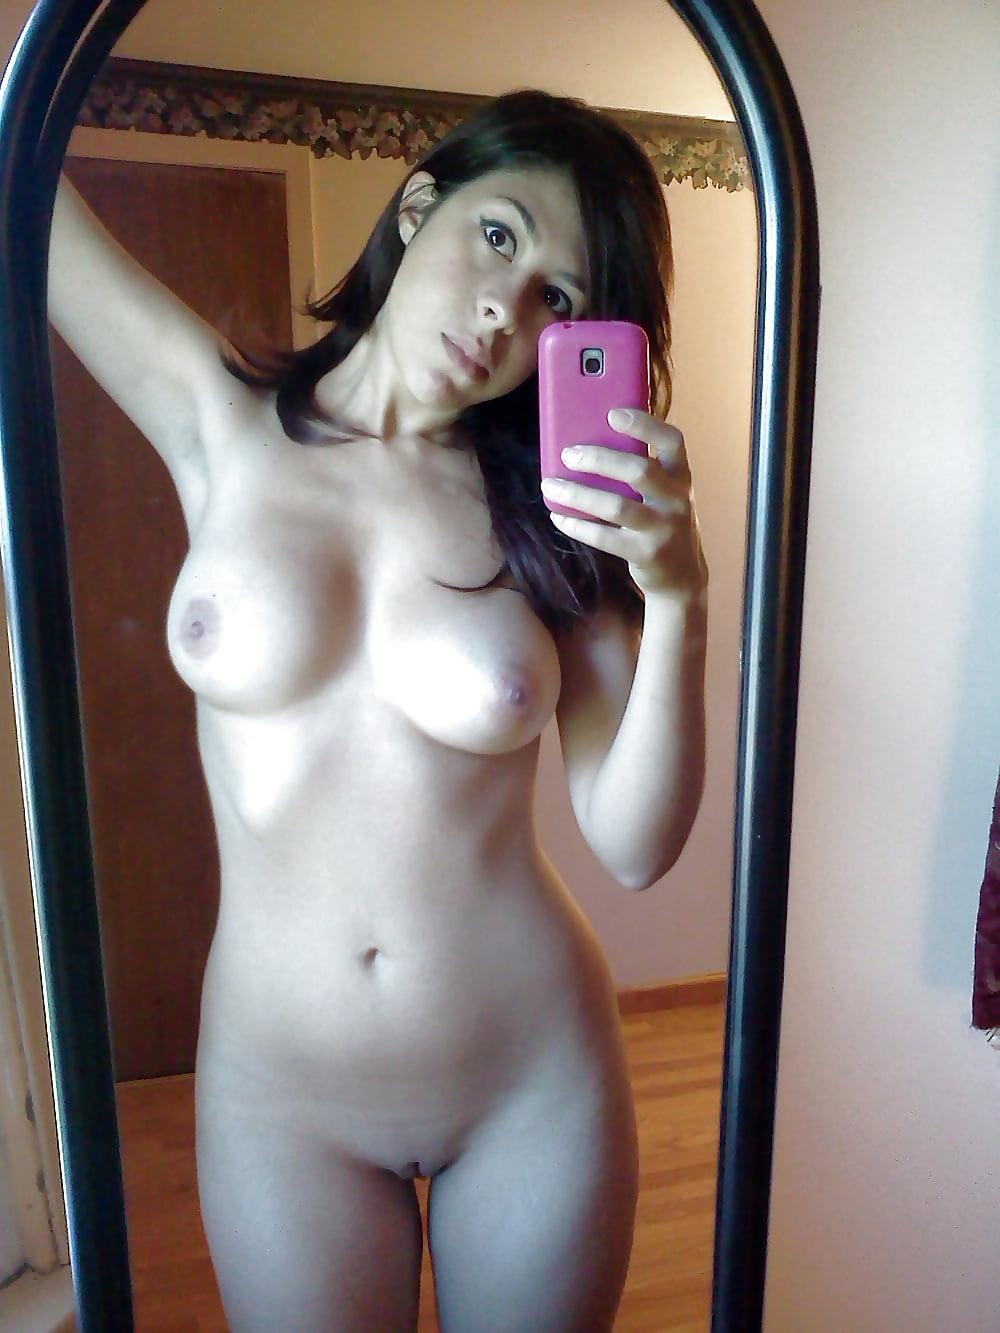 Teen Girl Mirror Pics Homemade Xxx Pics